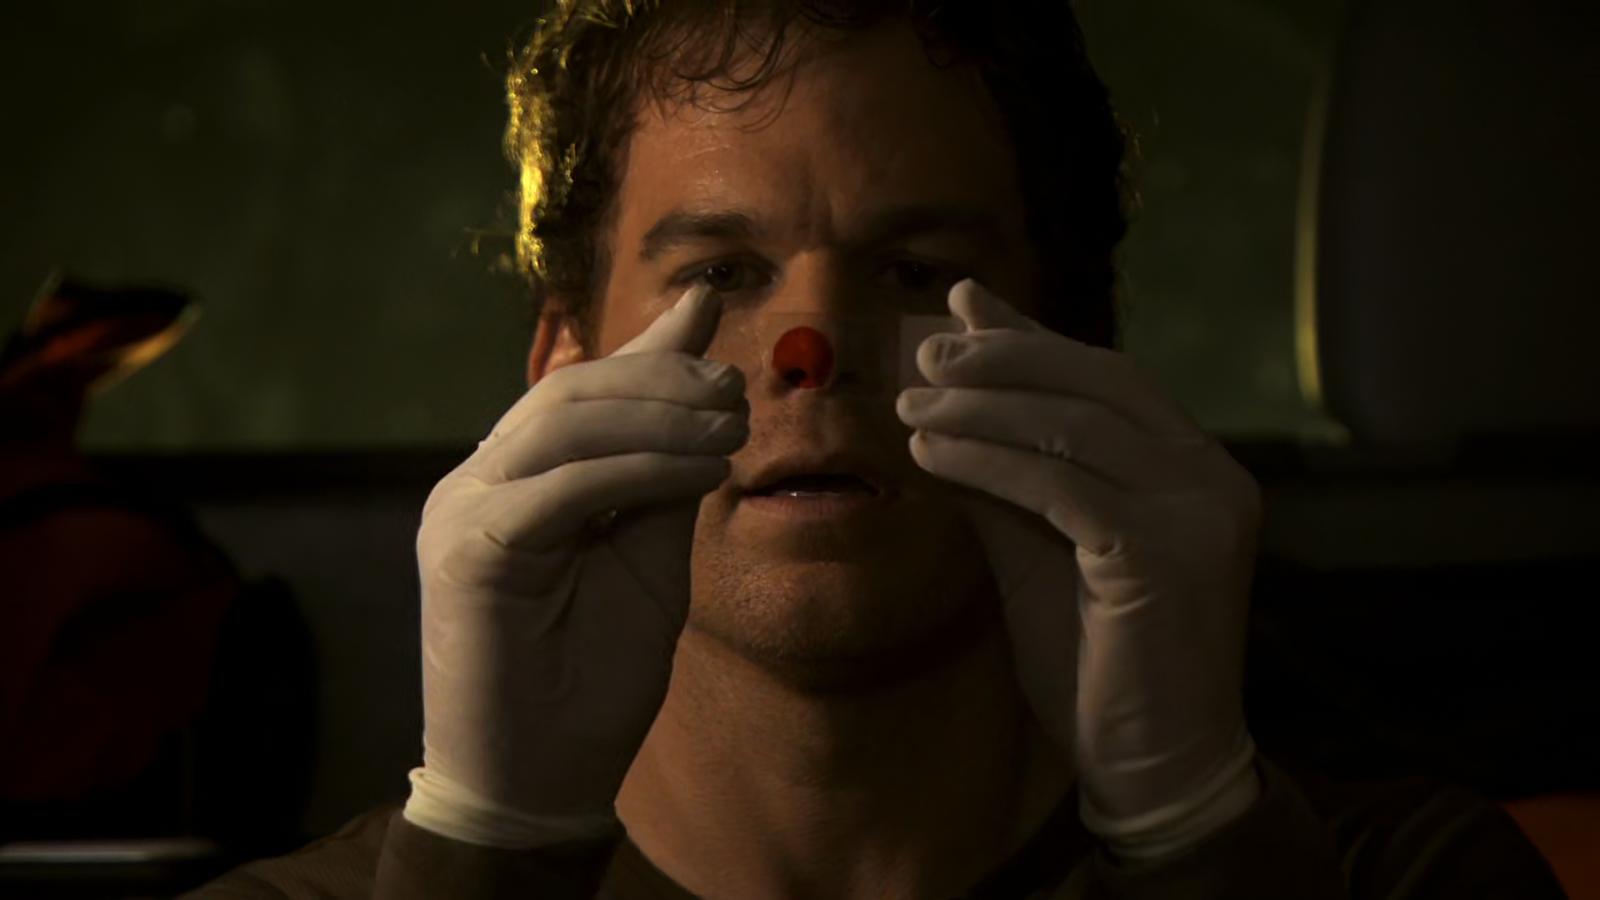 Dexter|Colección 1-8|Latino-Ingles|1080p|96/96|x265 10bit|+ Soundtracks  Image